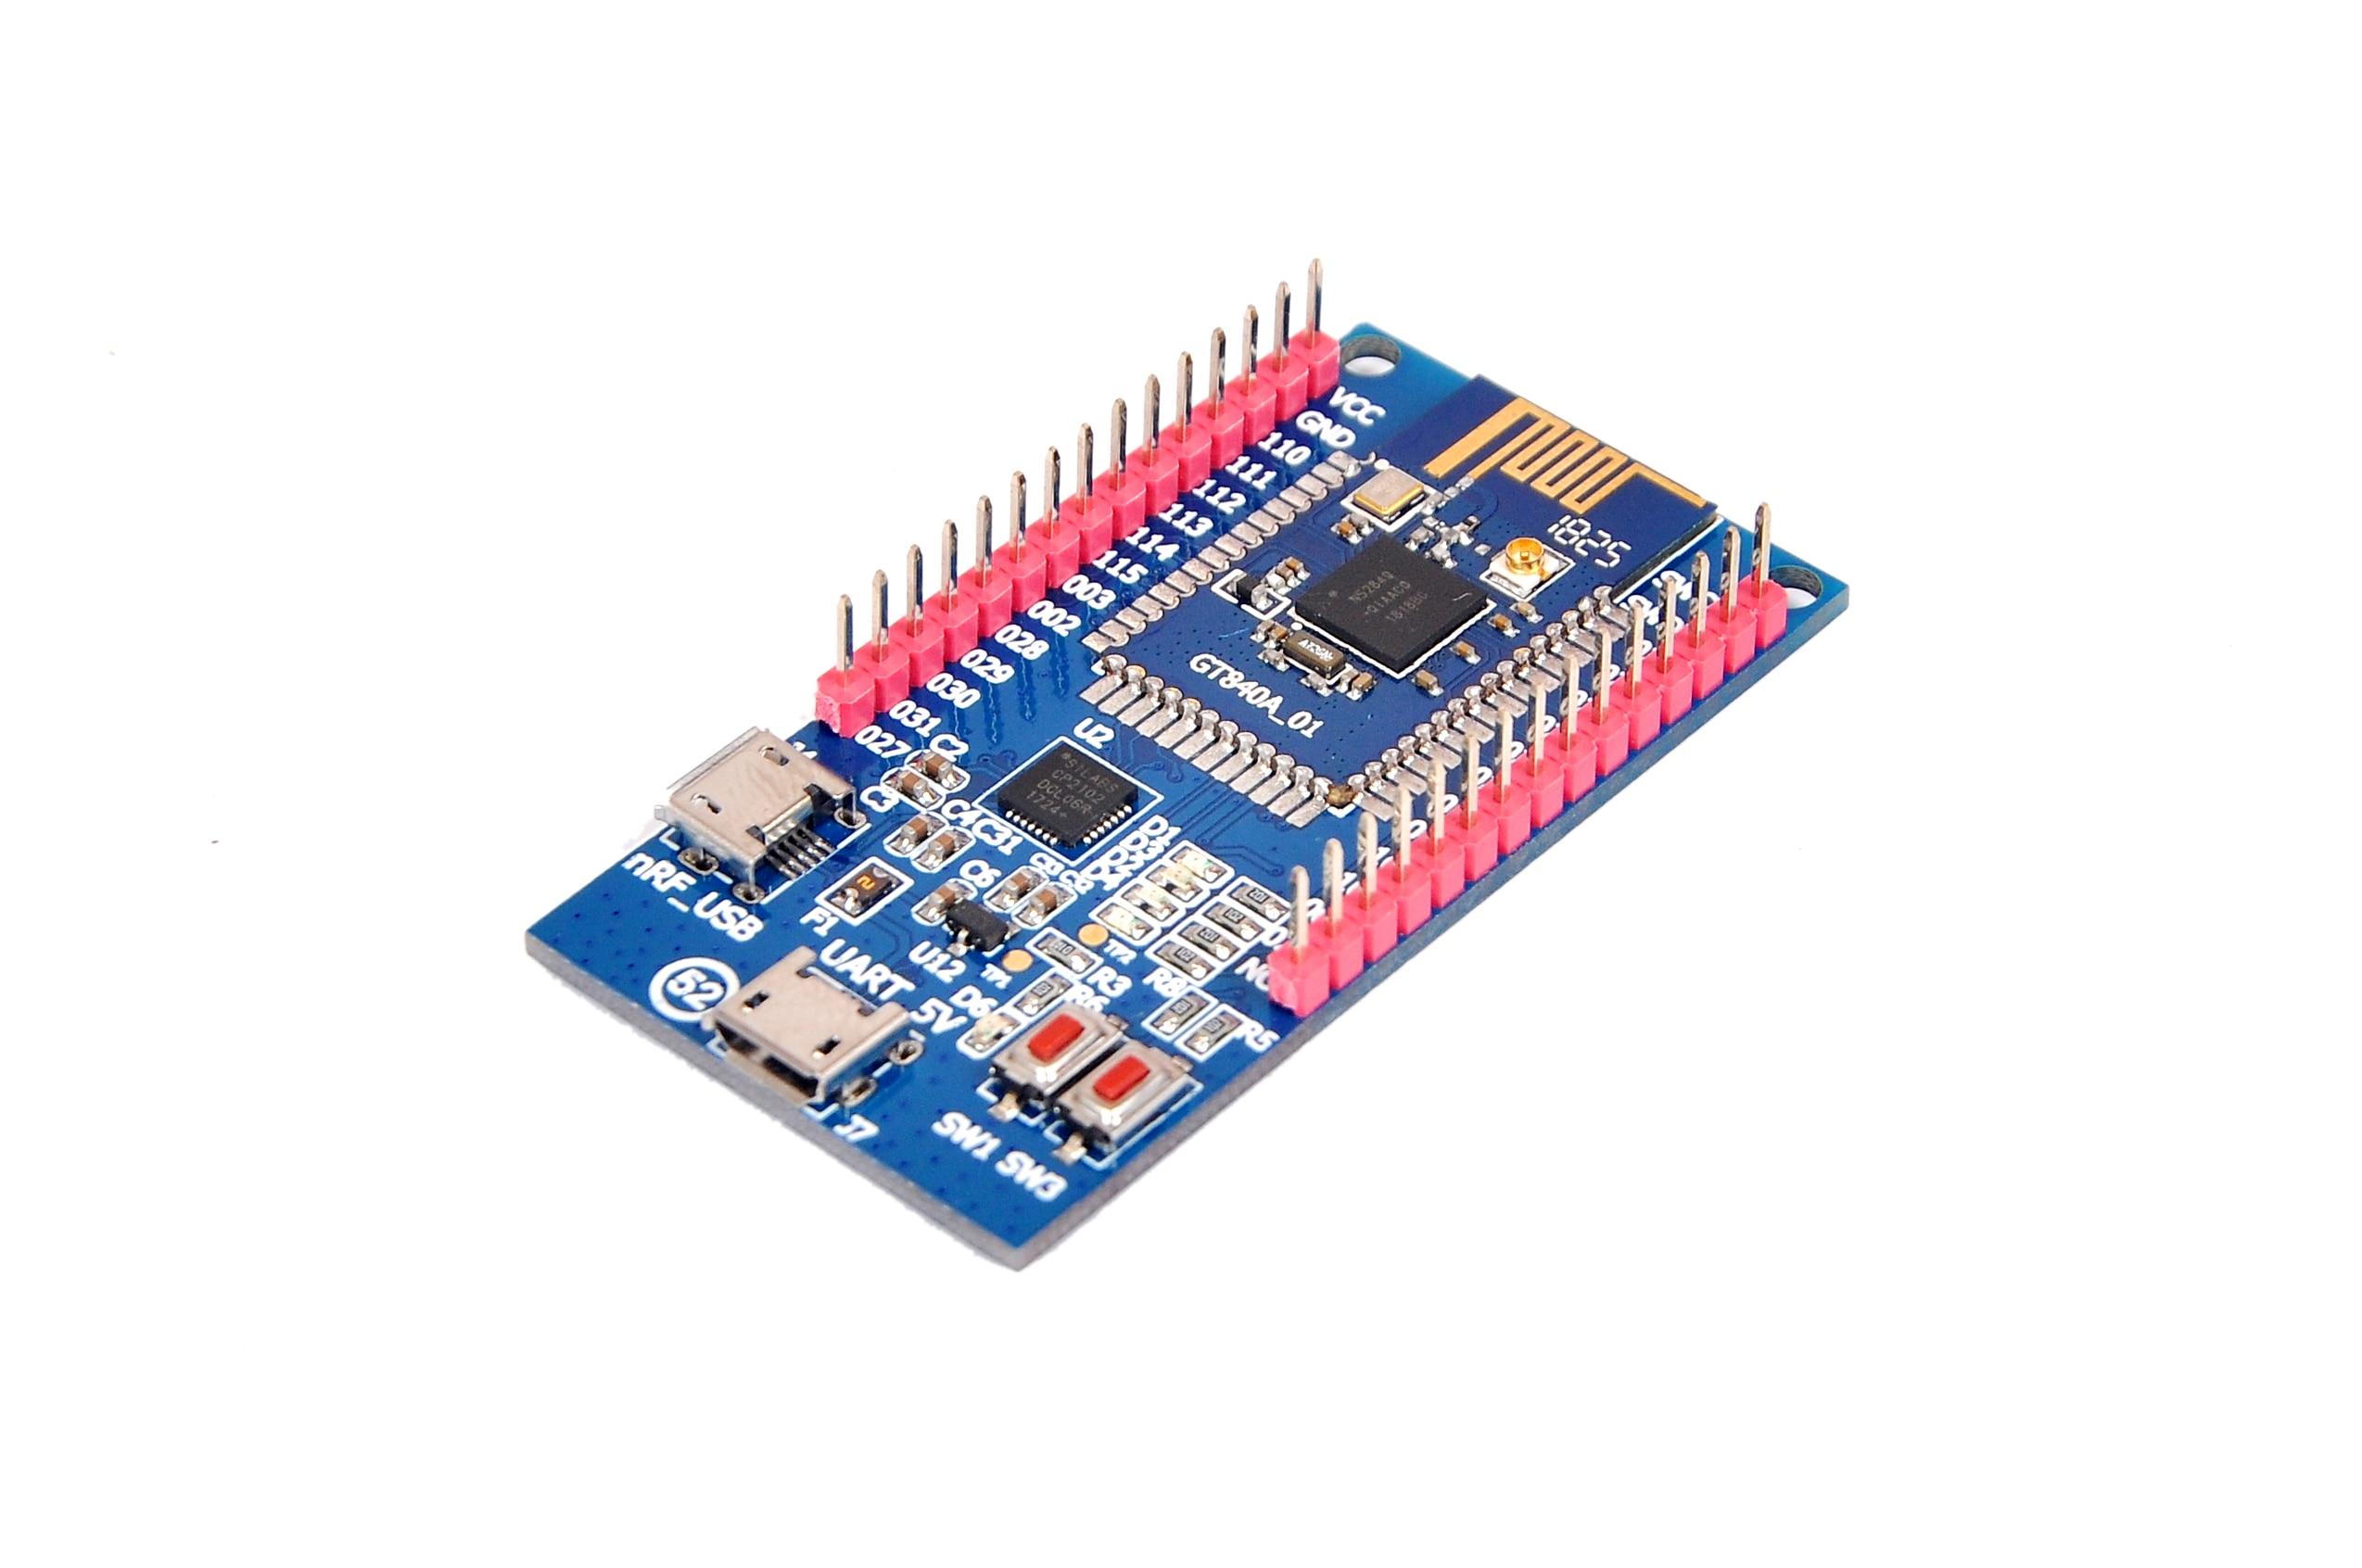 NRF52840 development board BREAKOUT Bluetooth 5 MESH ZIGBEE Bluetooth low power consumption vk1612z2m3l gps test board with low power consumption of beidou lna navigation service module development board